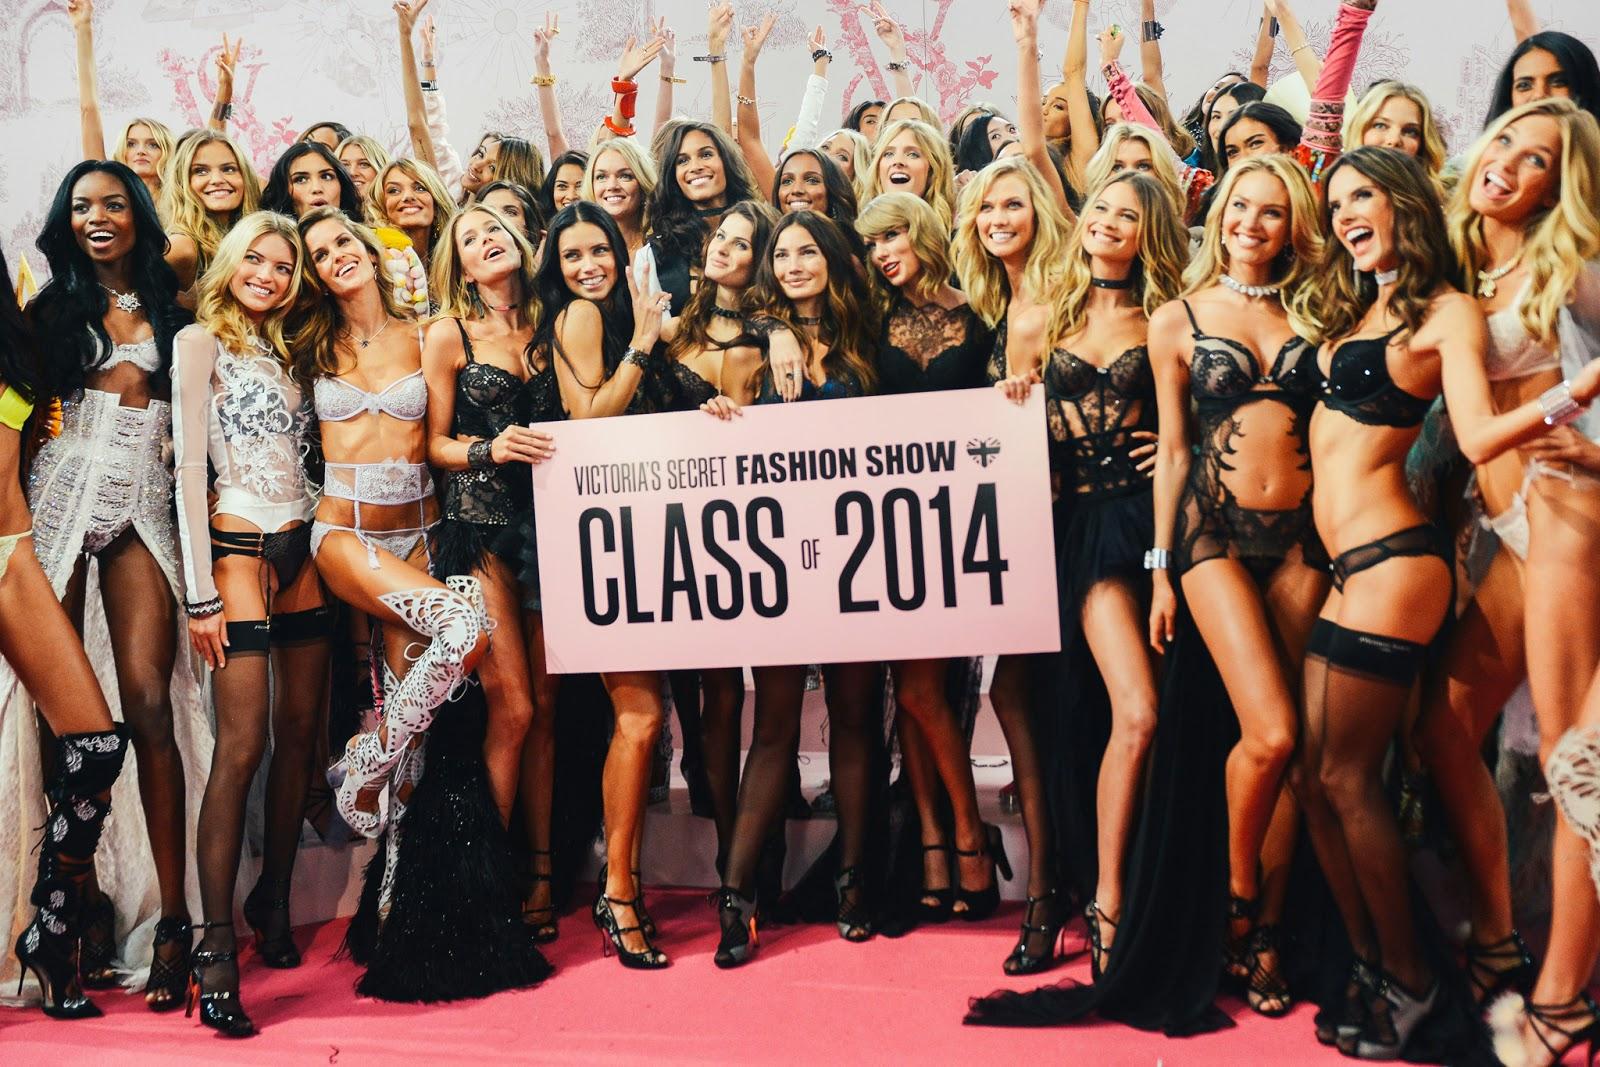 Op deze dag wordt de Victoria's Fashion Secret show 2015 uitgezonden